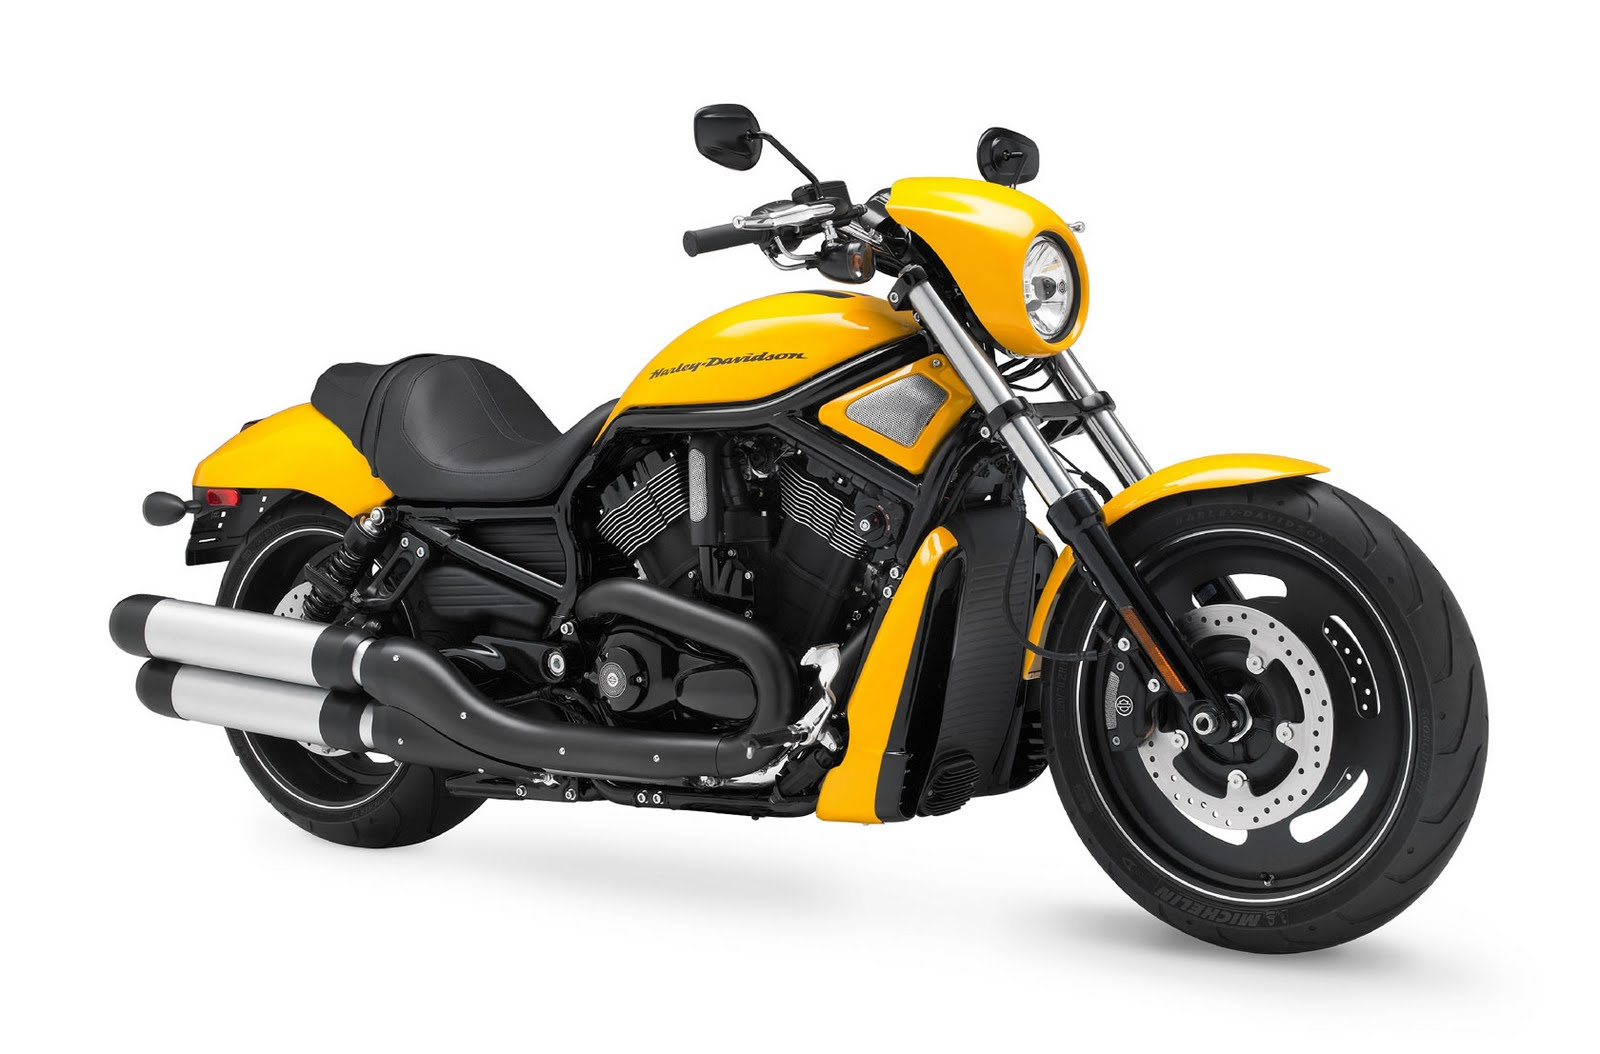 Harley Davidson Vrscdx Night Rod Special  Price